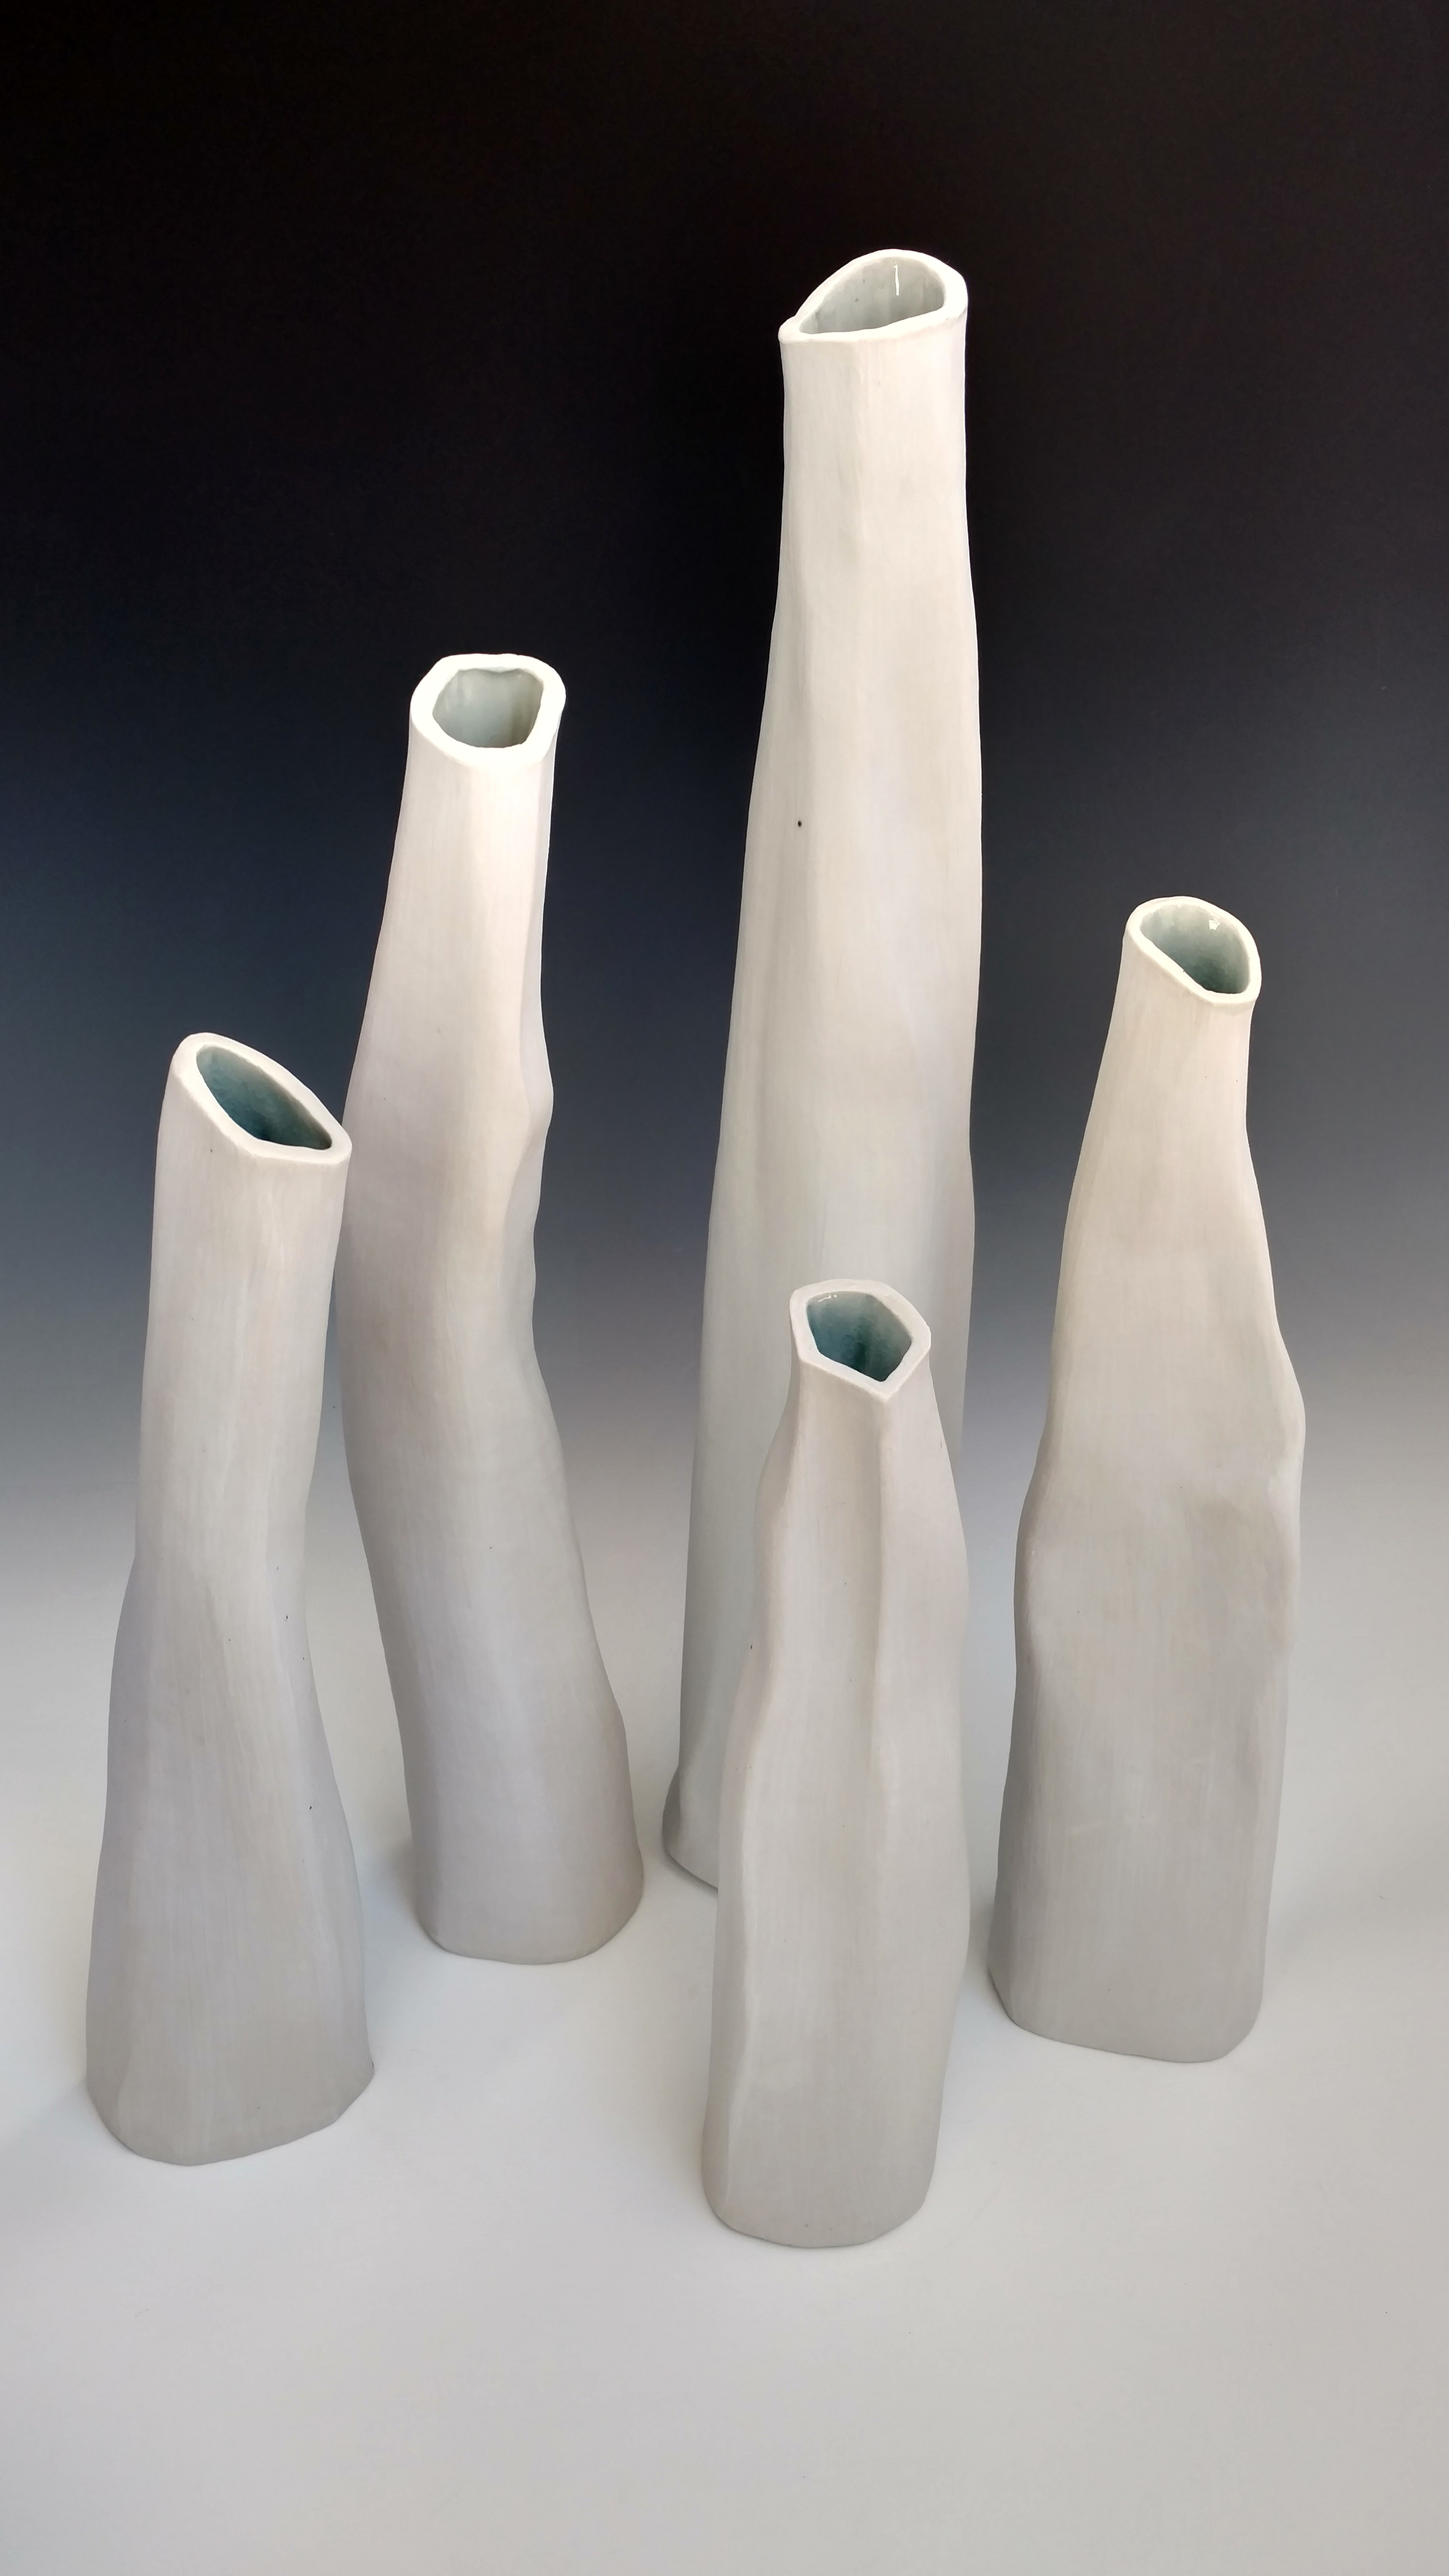 Crumpled vases